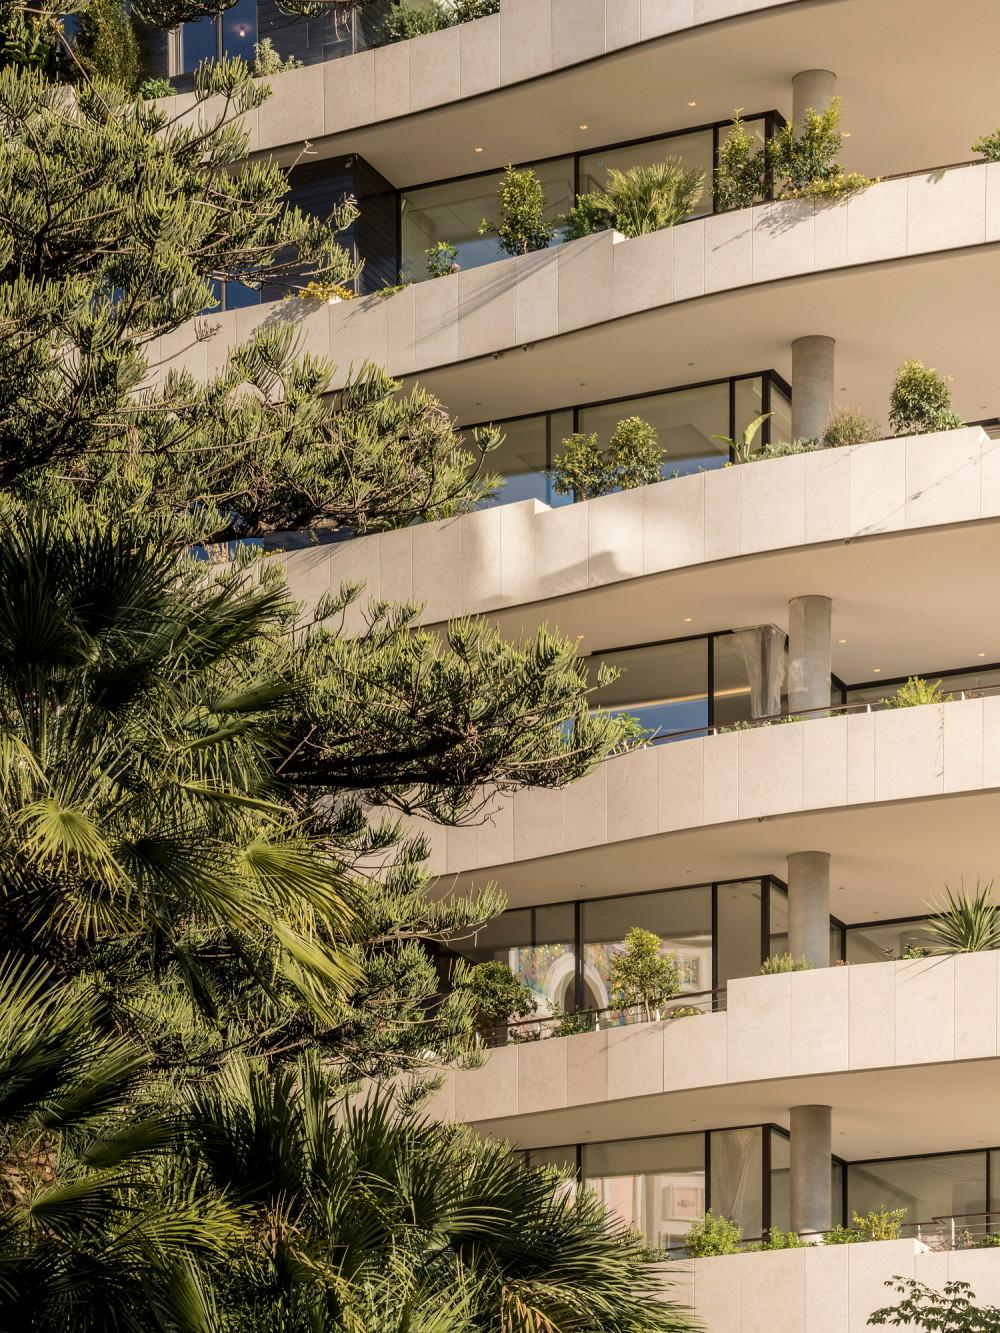 Edificio-La-Petite-Afrique_074-FG.jpg